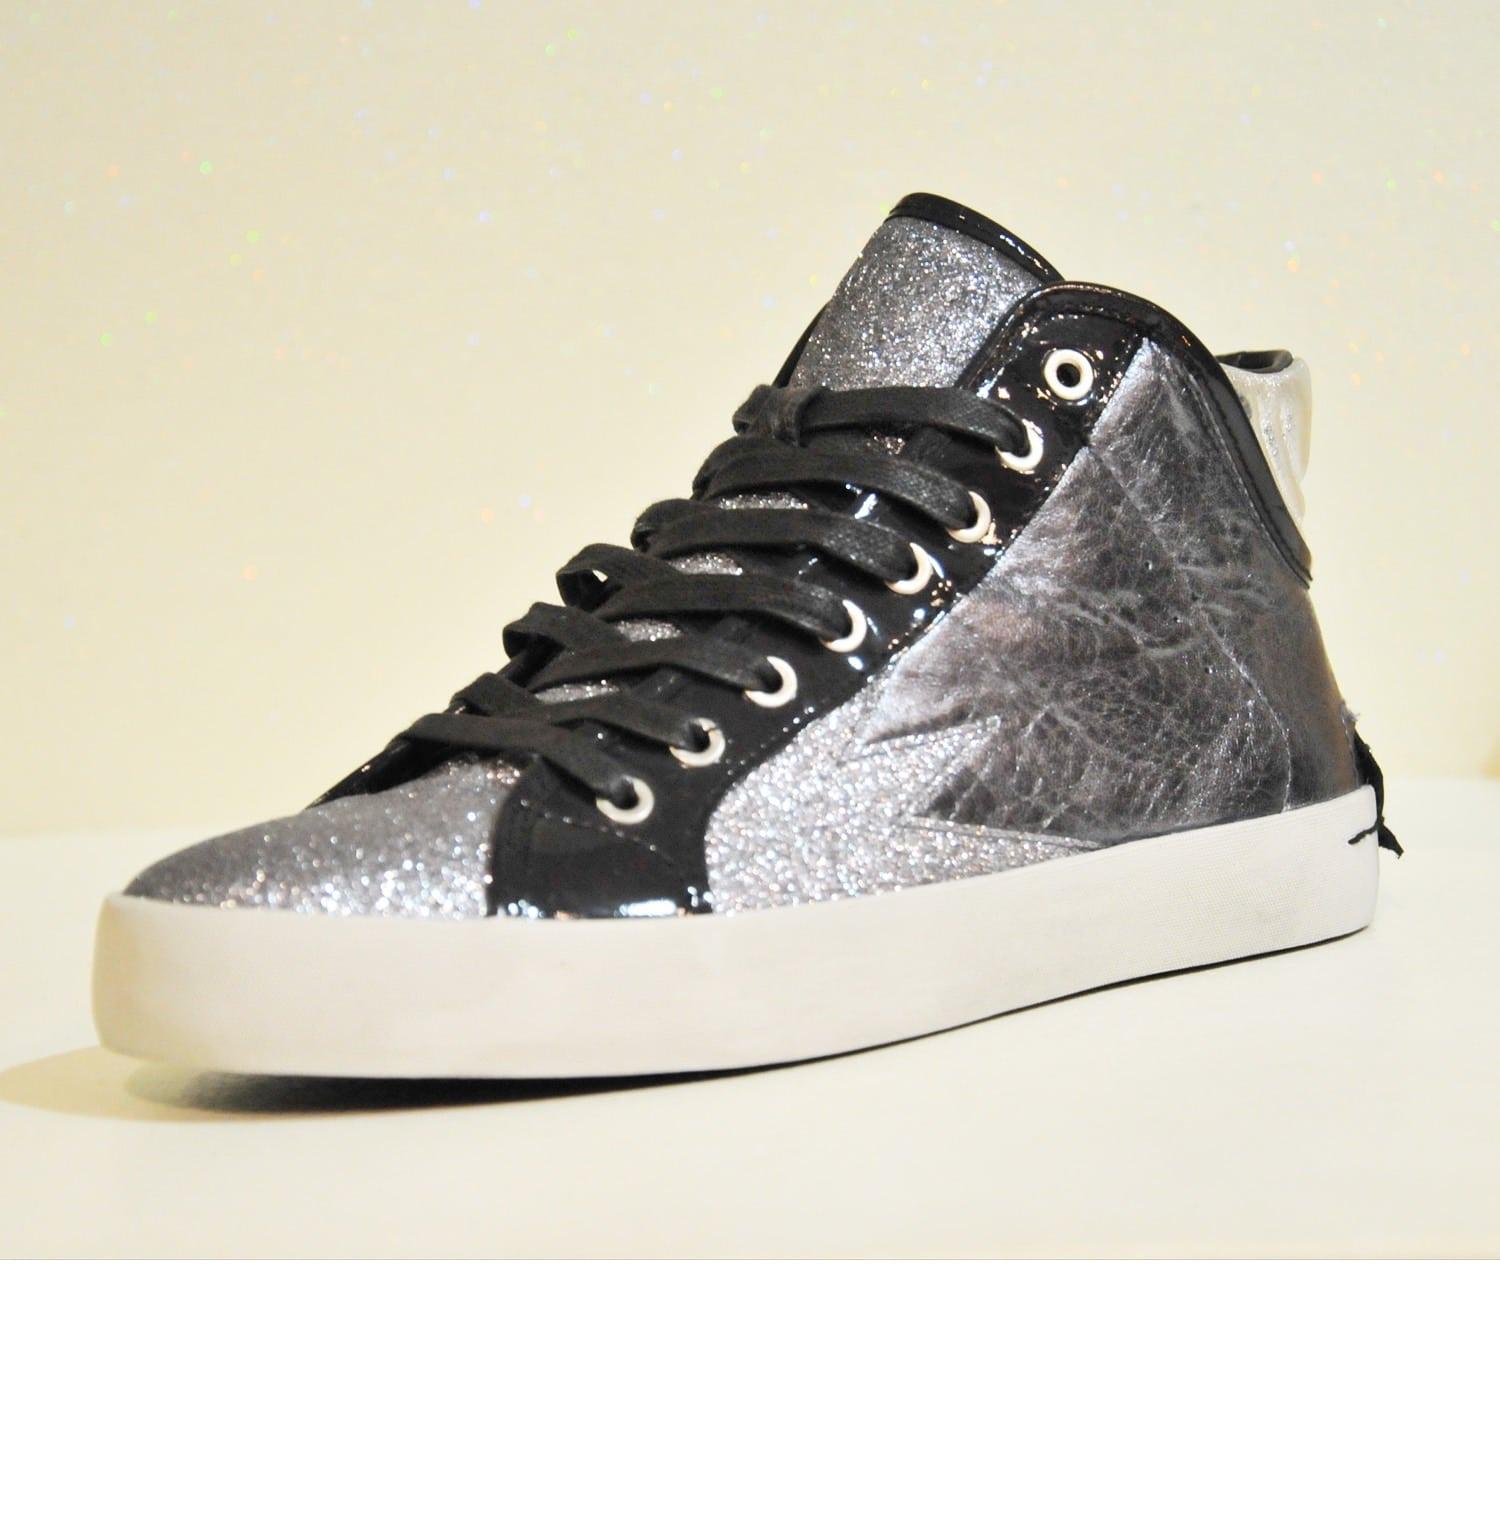 Moda Calzature Il Calzolaio Crime London Uomo Sneaker E Shop nxAY4wF b2dc3f2a391